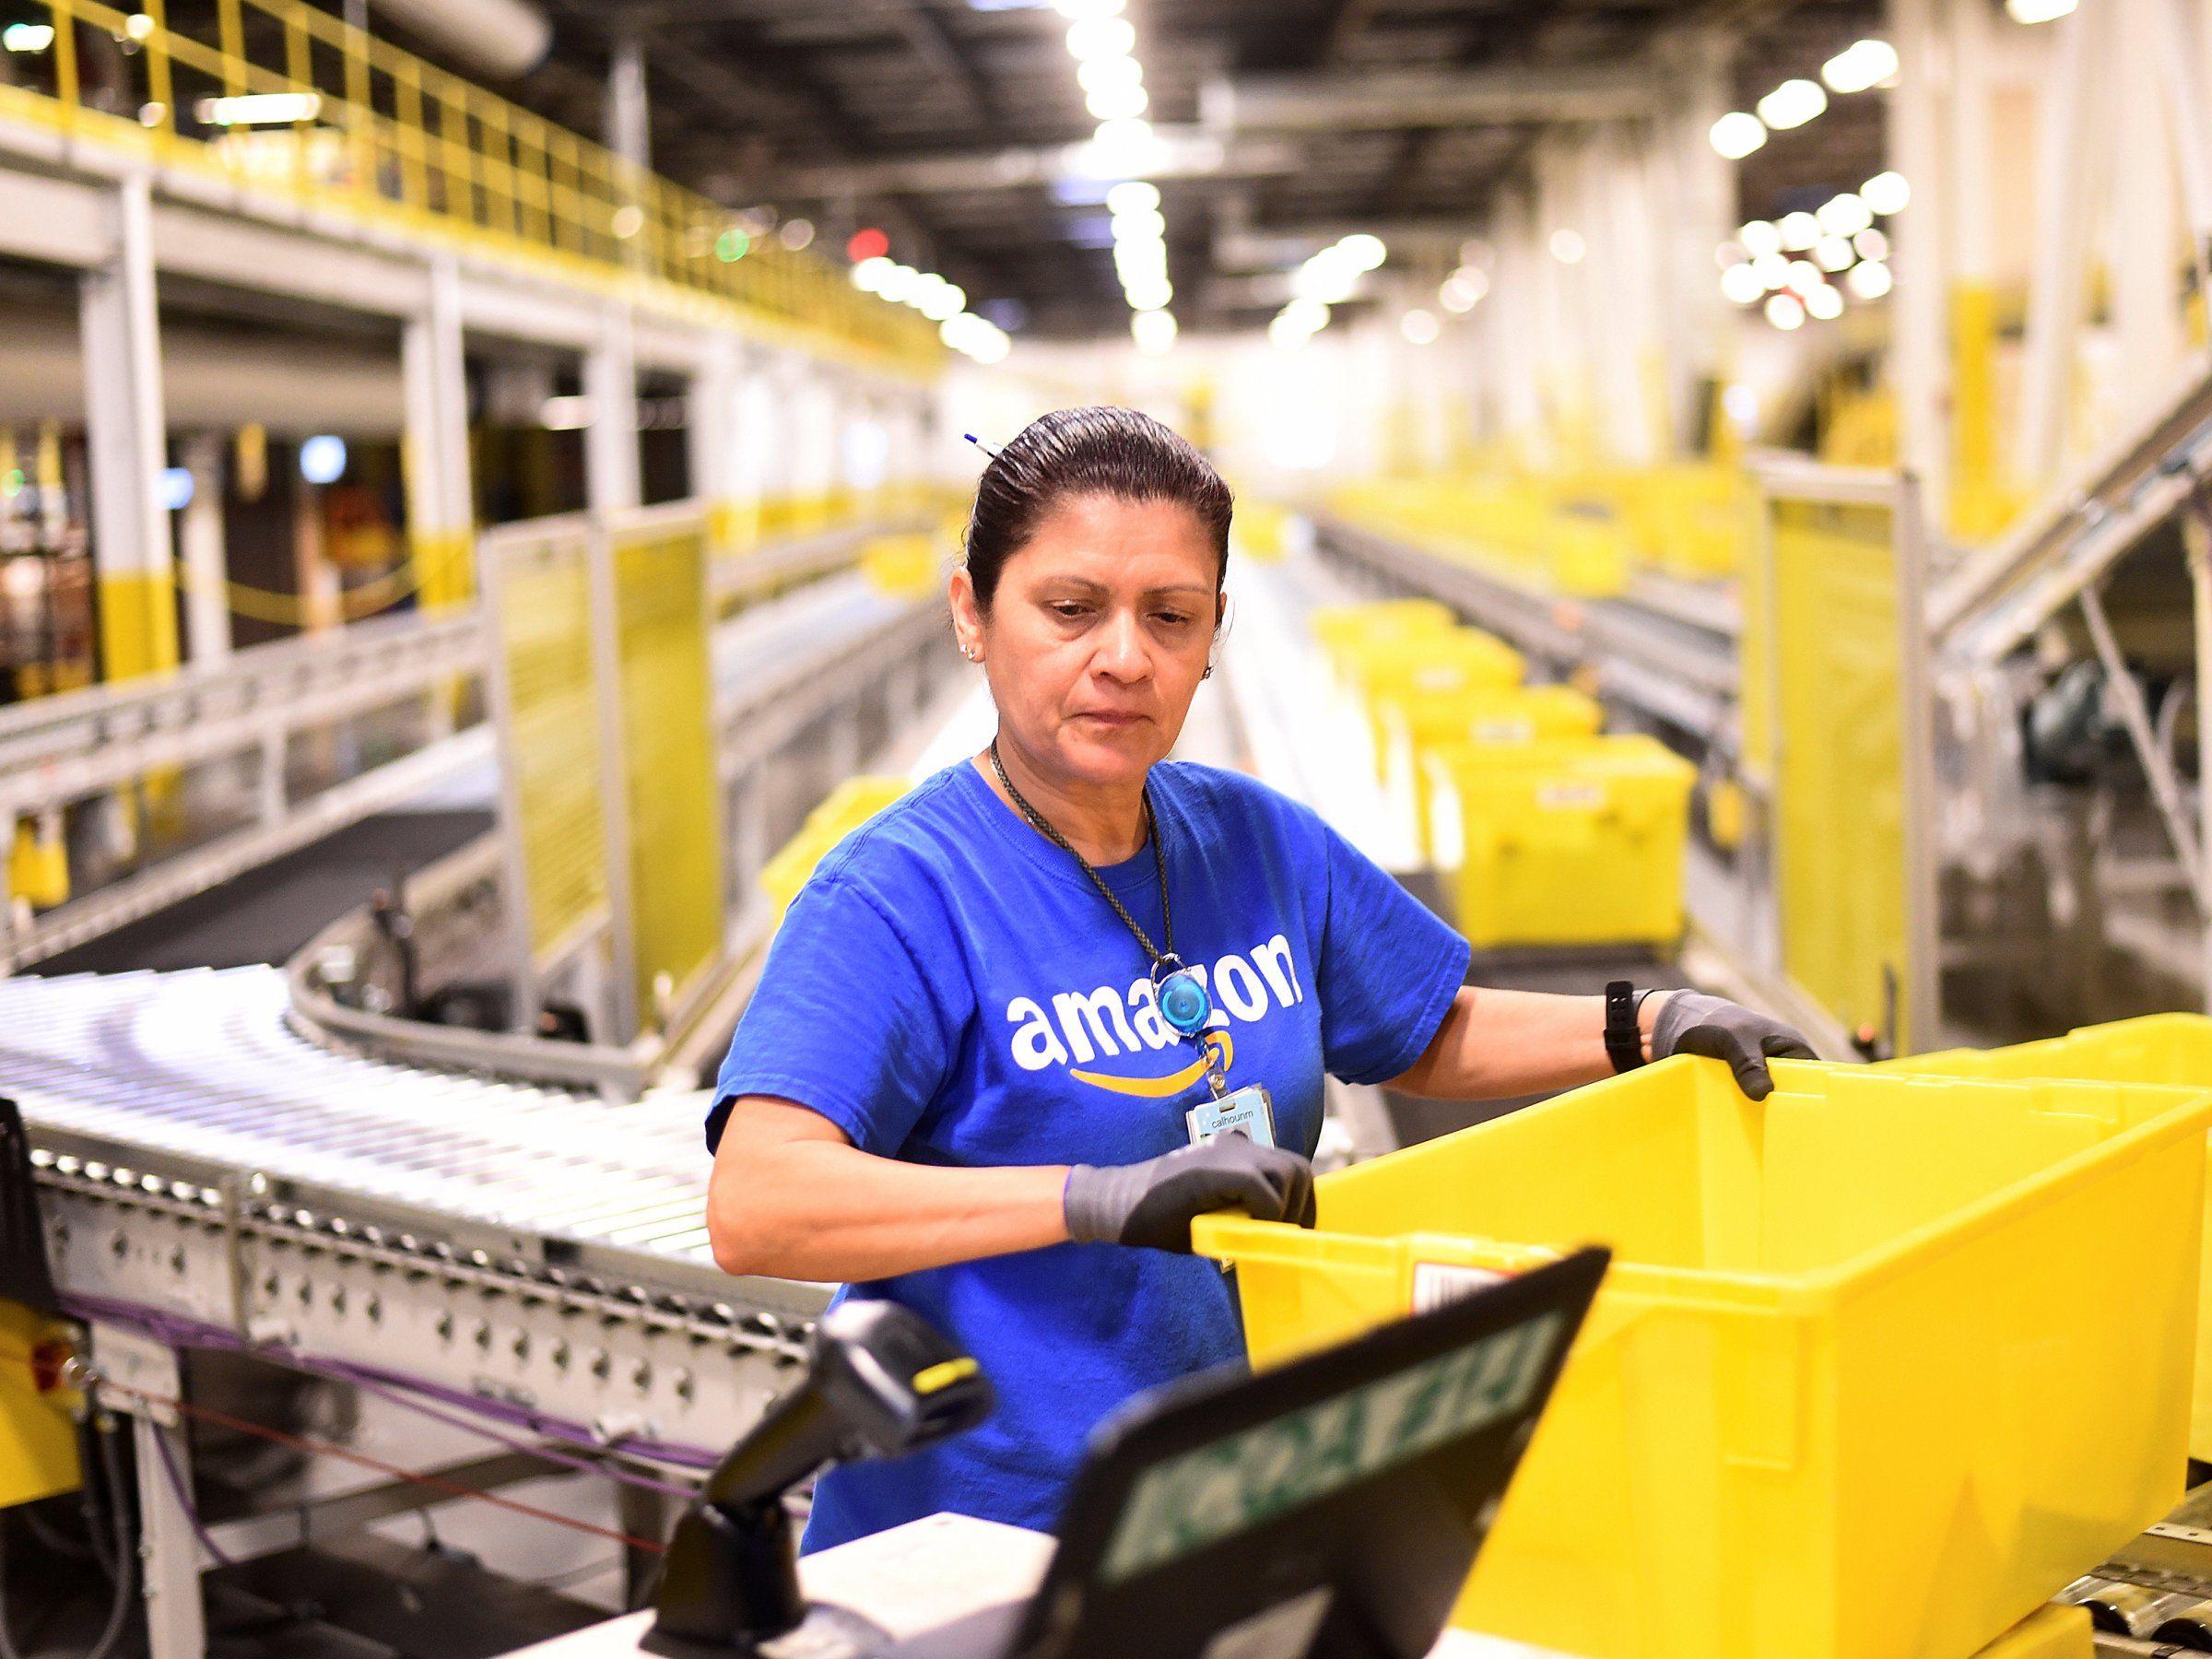 Amazon S New 5 Billion Headquarters Could Transform Its Host City Amazon Jobs Amazon Stock Amazon Stock Price